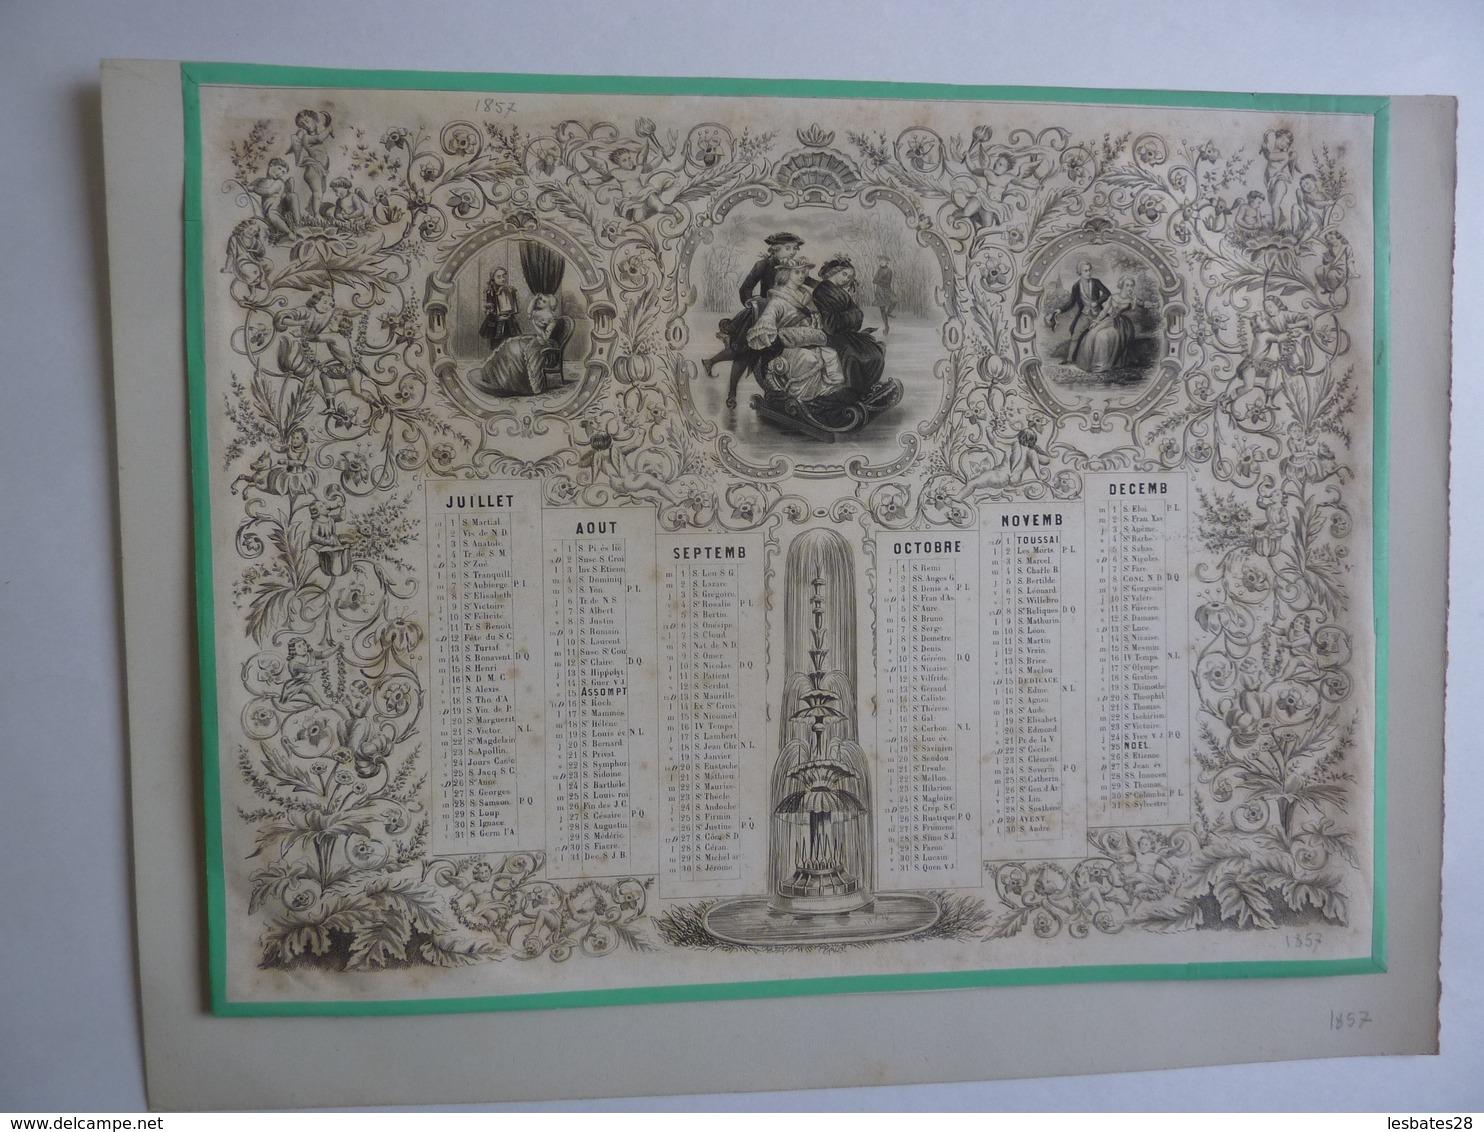 LITHOGRAPHIE- ALMANACH - CALENDRIER  1857  Allegorie Séduction   Idylle /Angelots  - - Calendriers